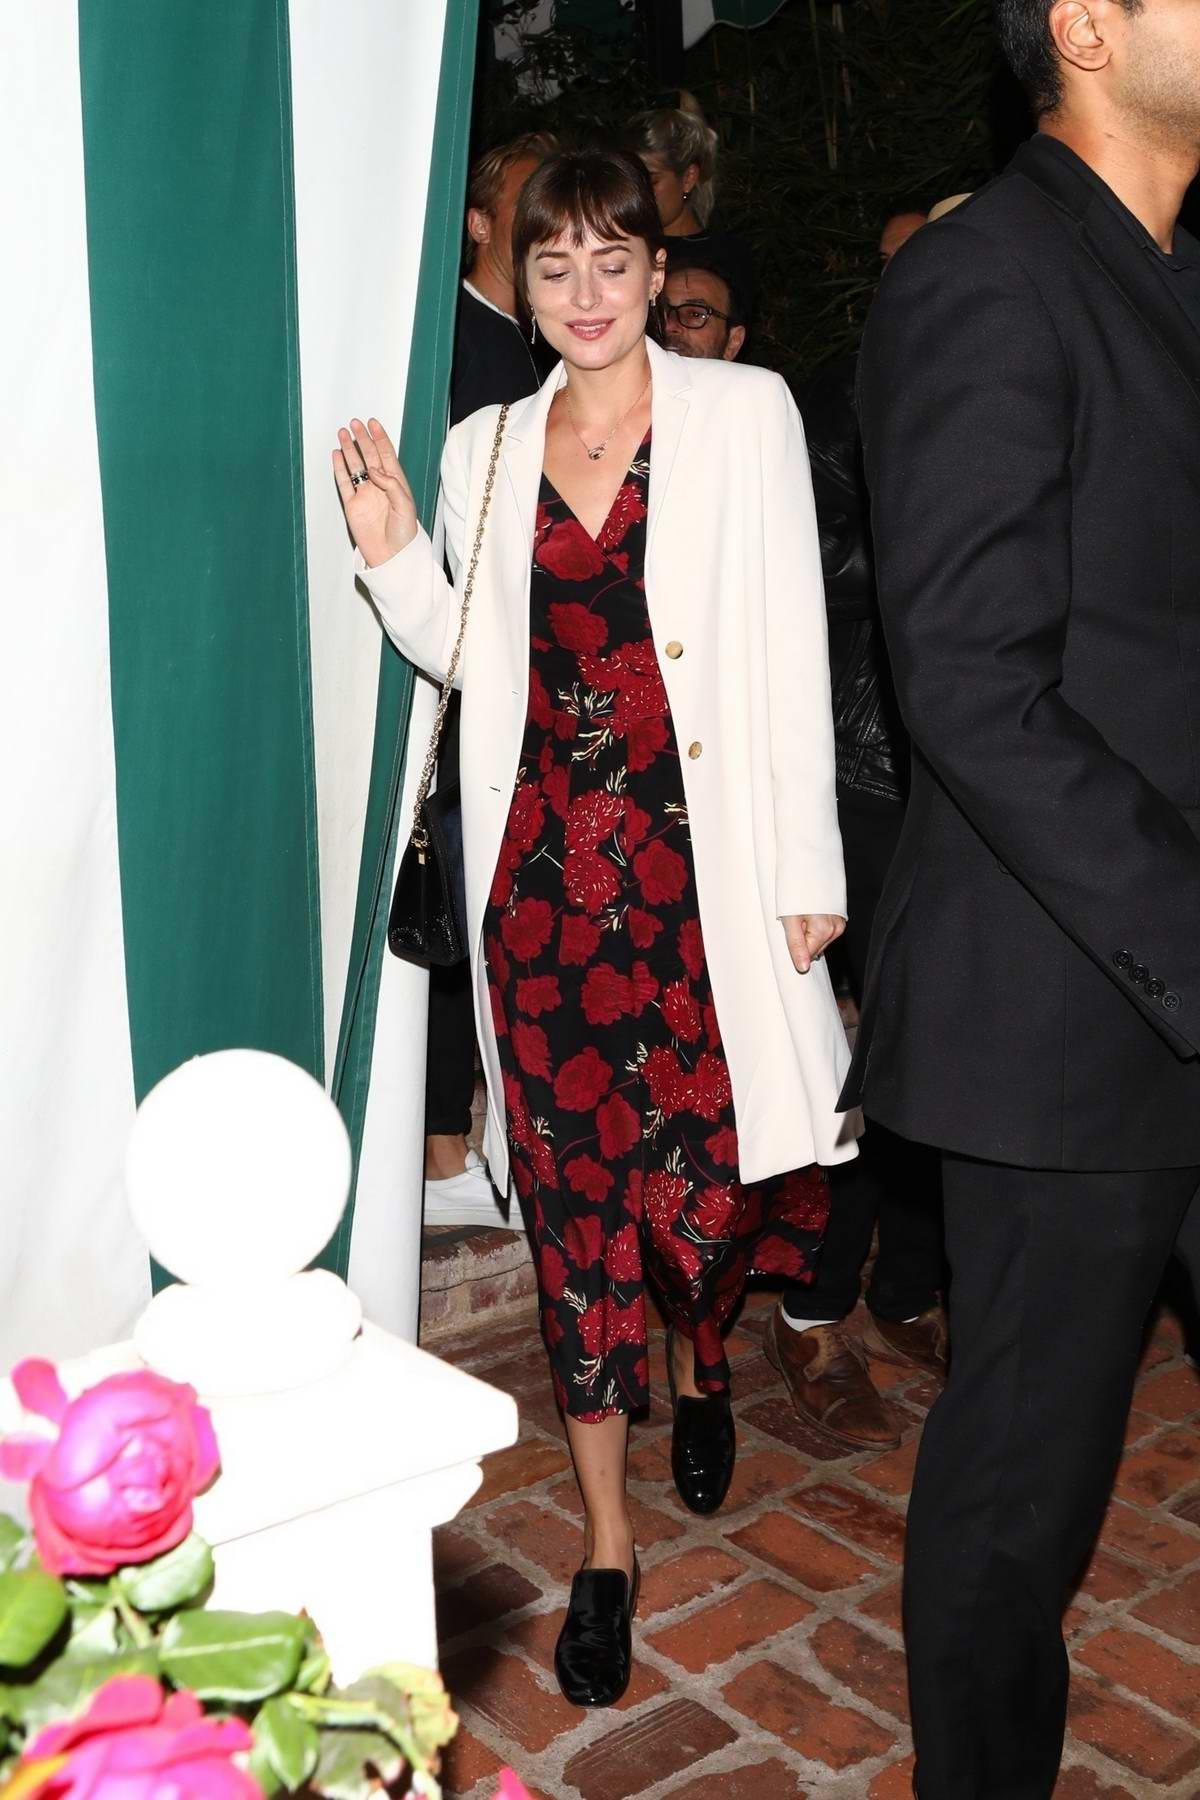 Dakota Johnson attends her sister Stella Banderas's birthday dinner in Los Angeles